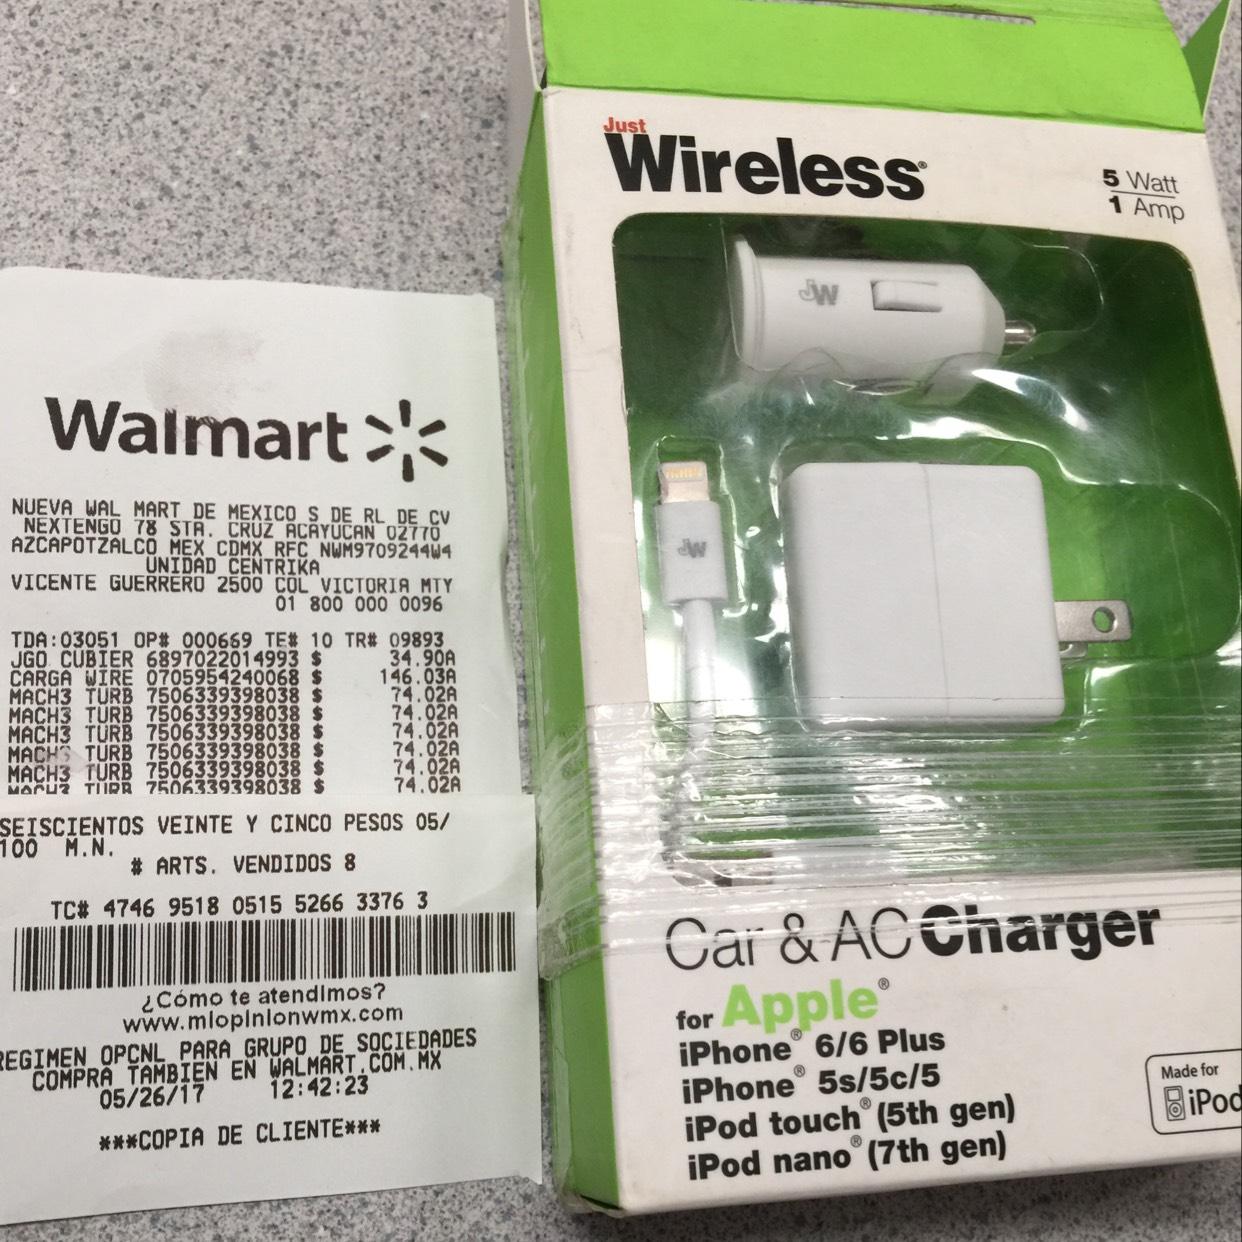 Walmart Centrika: APPLE Cargador casa y carro con cable a $146.03